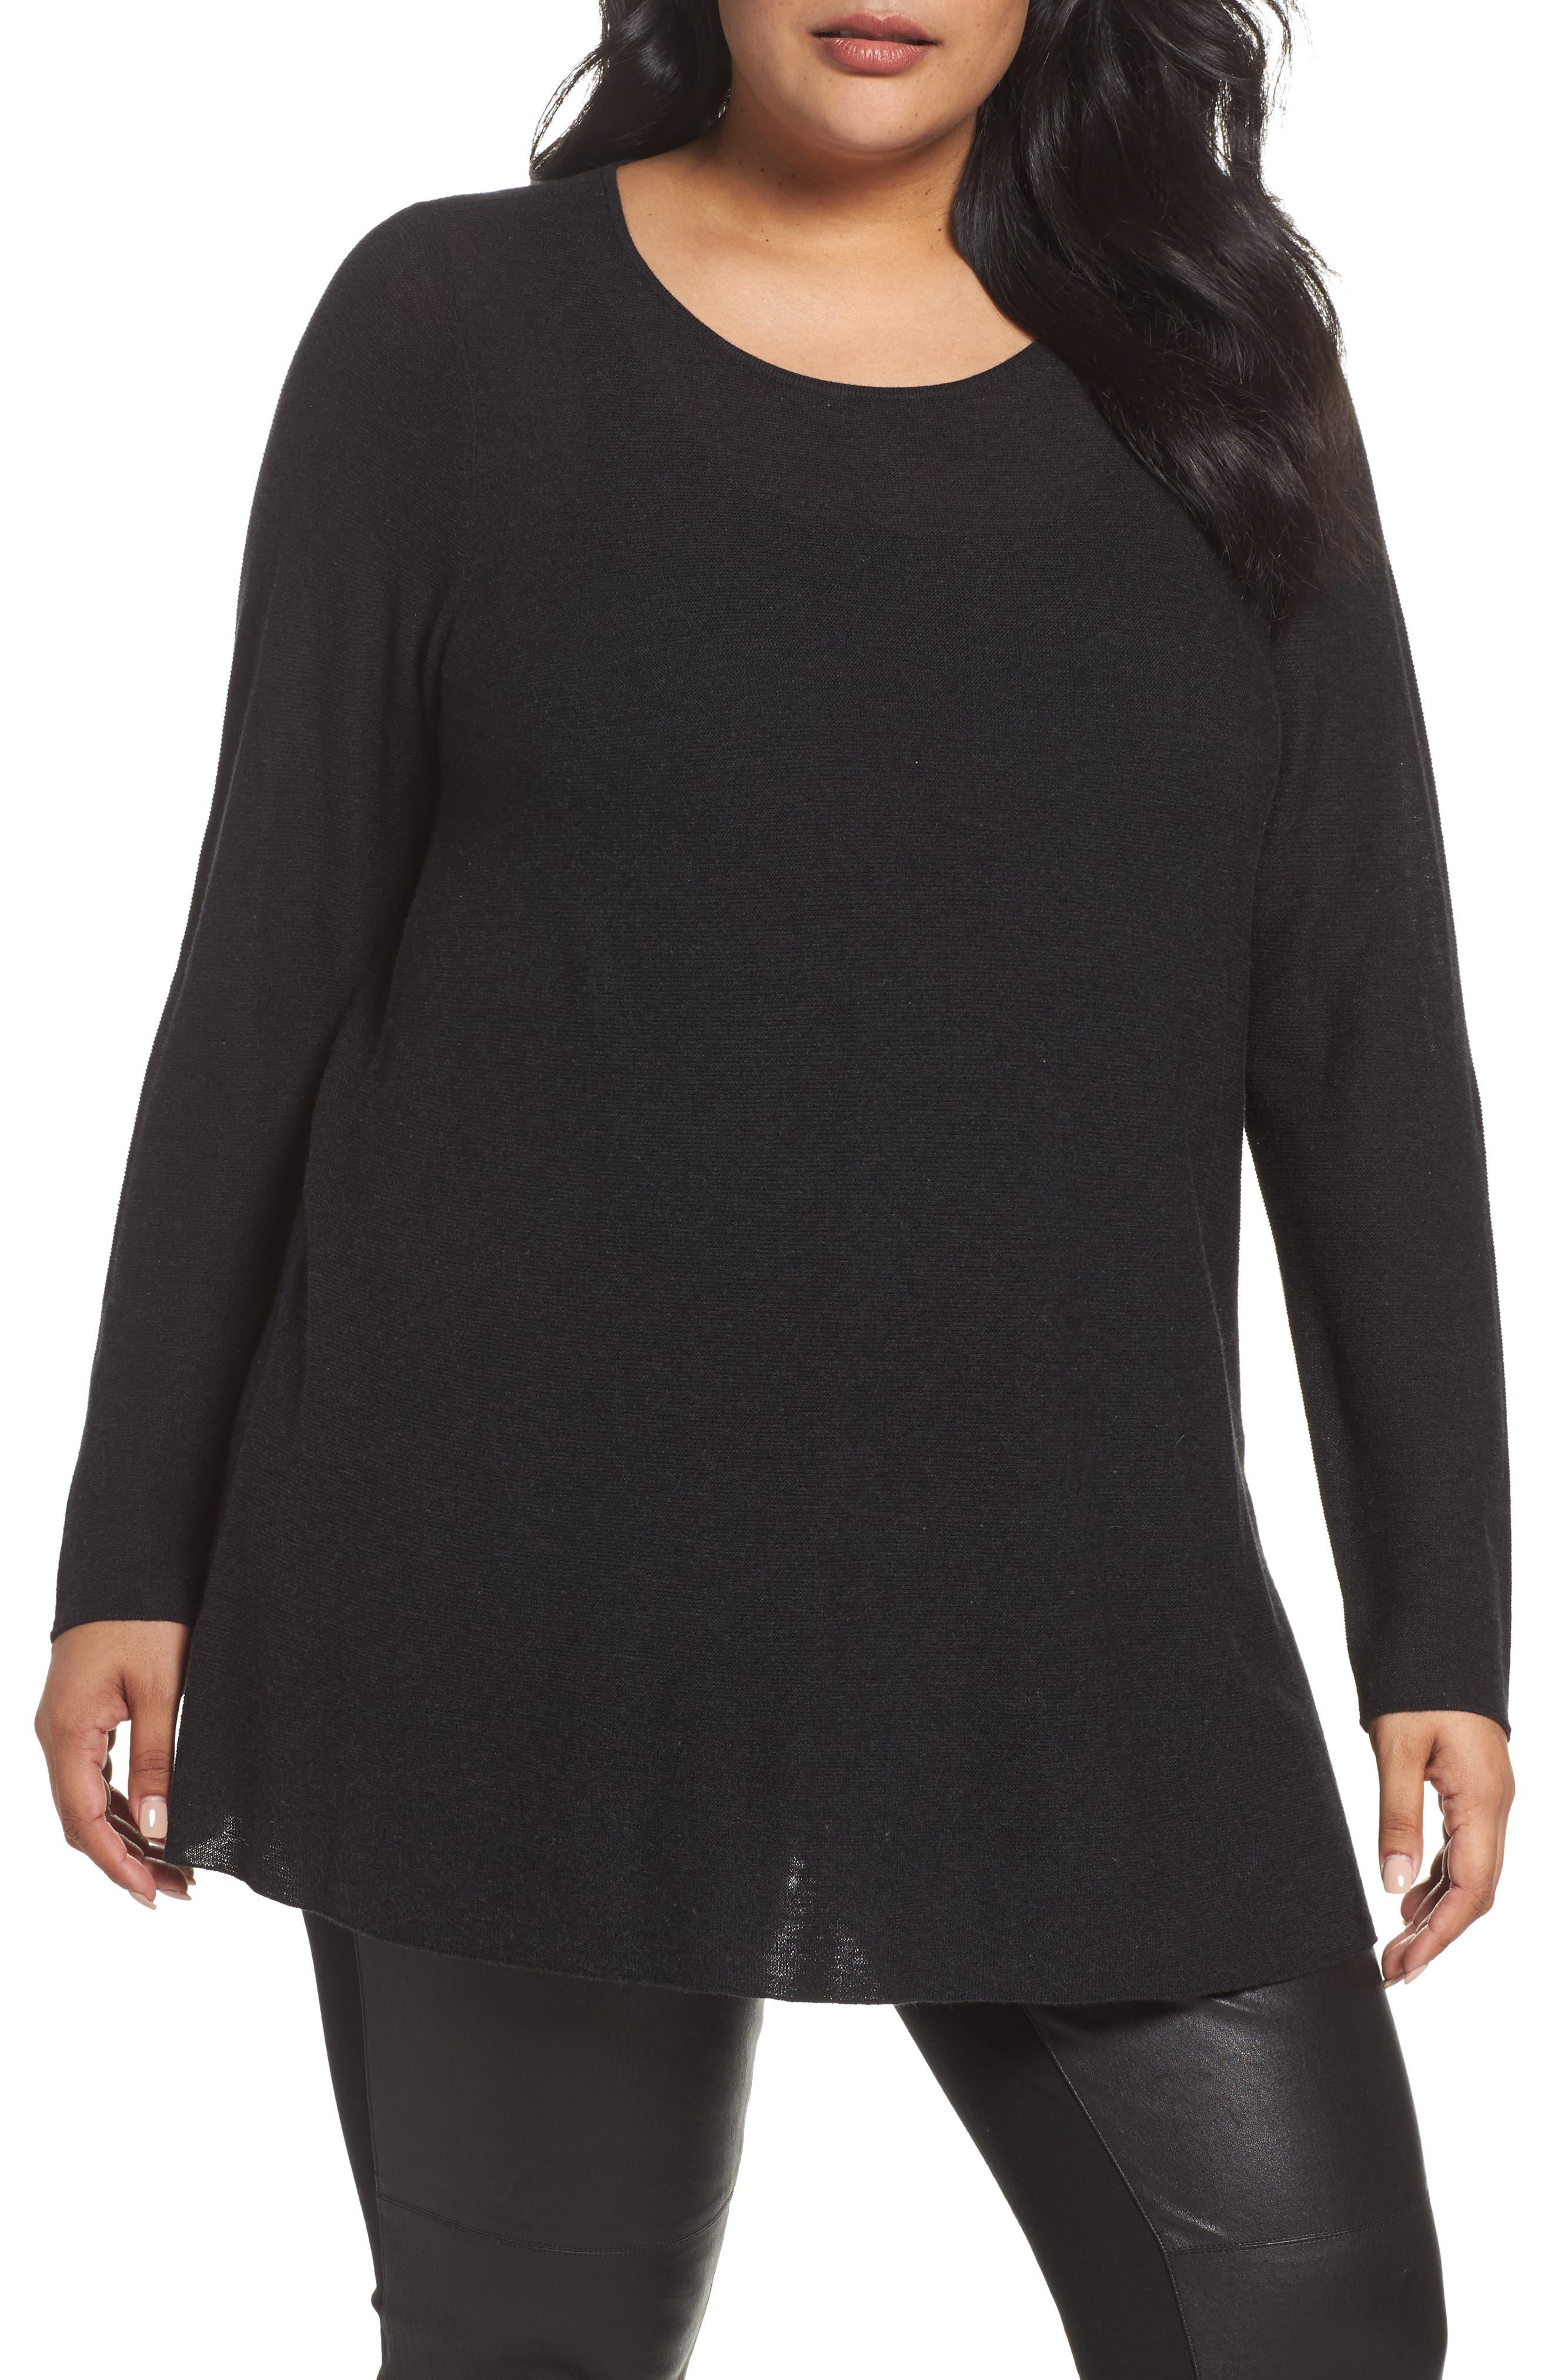 Main Image - Eileen Fisher Jewel Neck Tunic Sweater (Plus Size)